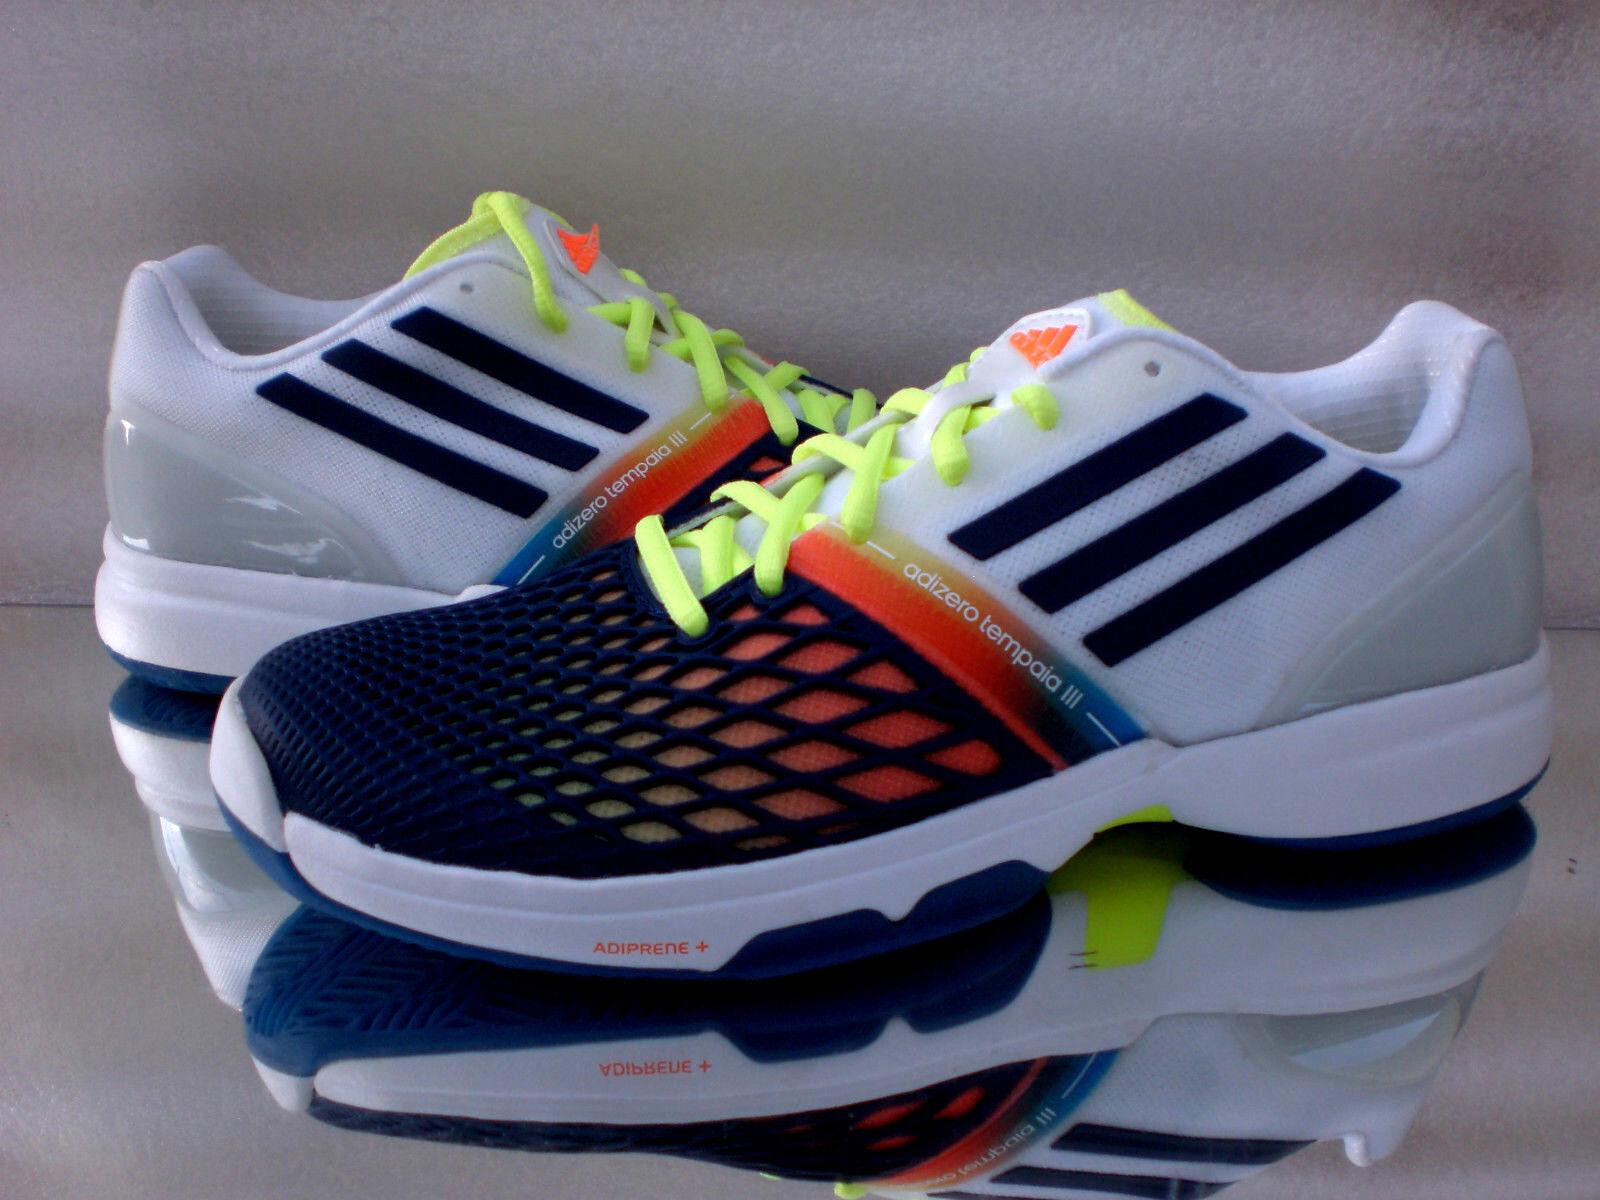 Zapatos promocionales para hombres y mujeres Adidas CC Adizero Tempaia III Turn/Laufschuhe Sneaker Q22078 neu